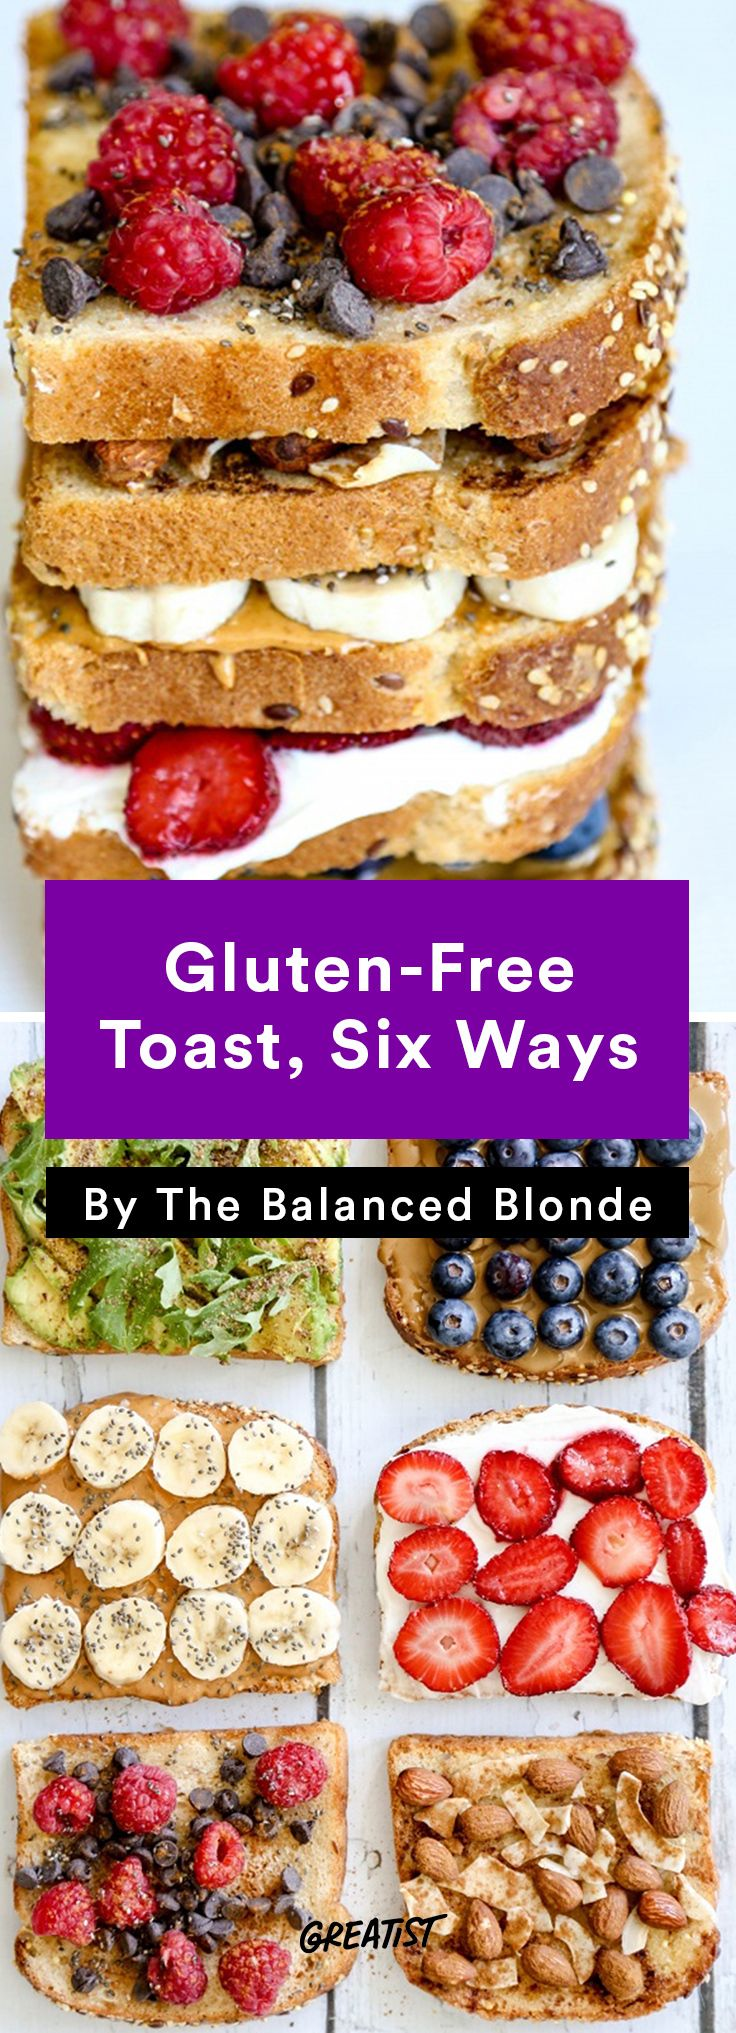 1. Gluten-Free Toast, Six Ways #healthy #breakfast #recipes http://greatist.com/eat/healthy-breakfast-recipes-that-keep-you-full